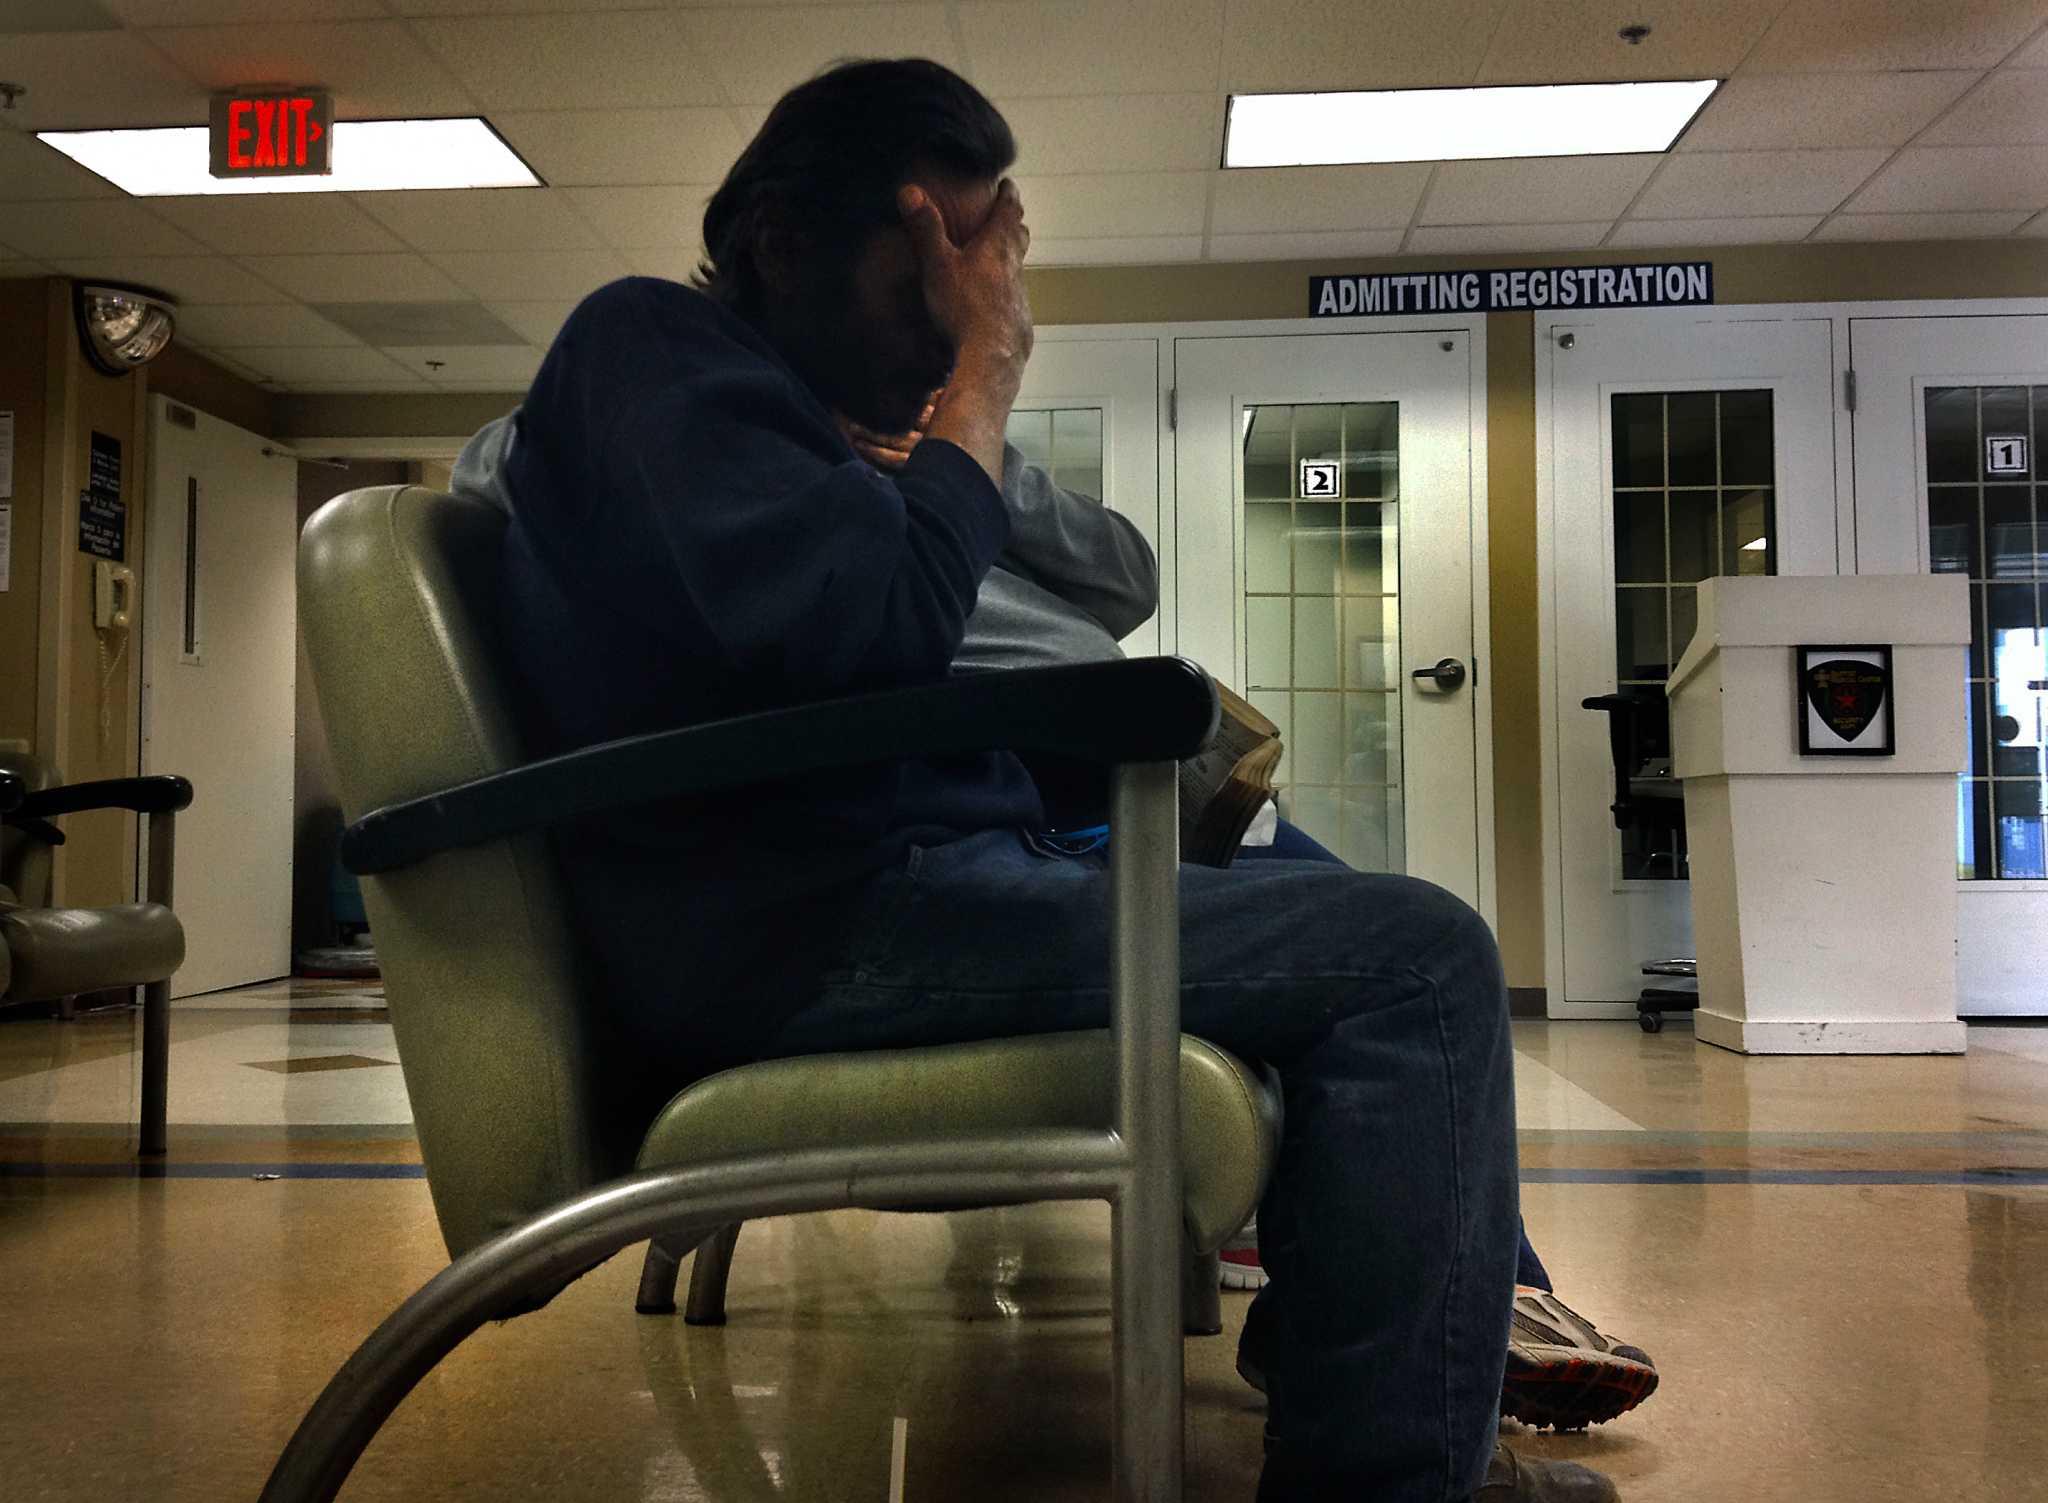 Asten Jones\' Story: An unexpected turn - San Antonio Express-News